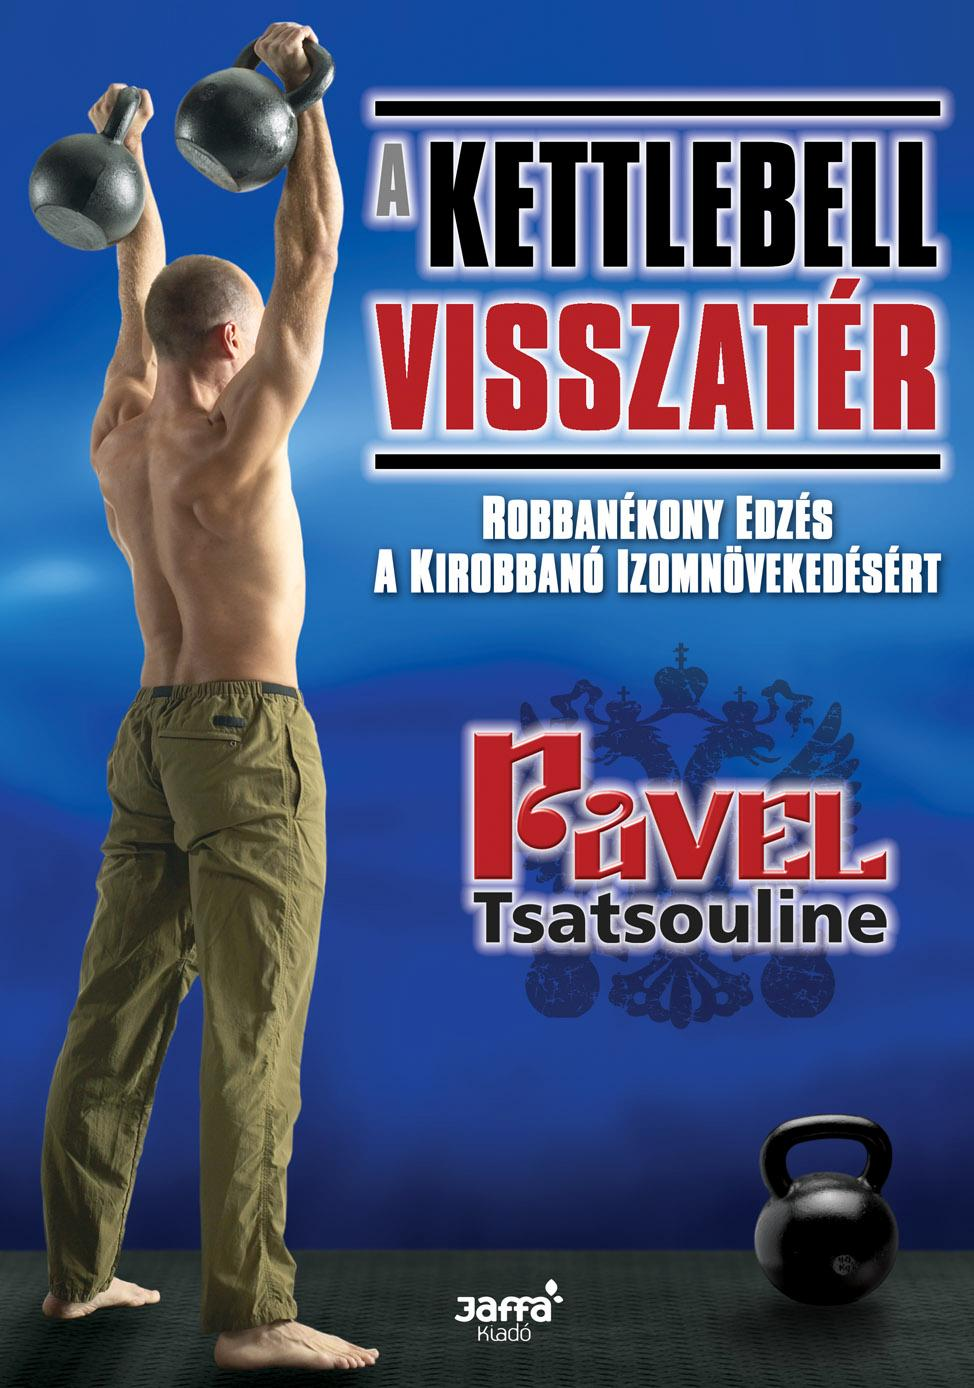 TSATSOULINE, PAVEL - A KETTLEBELL VISSZATÉR